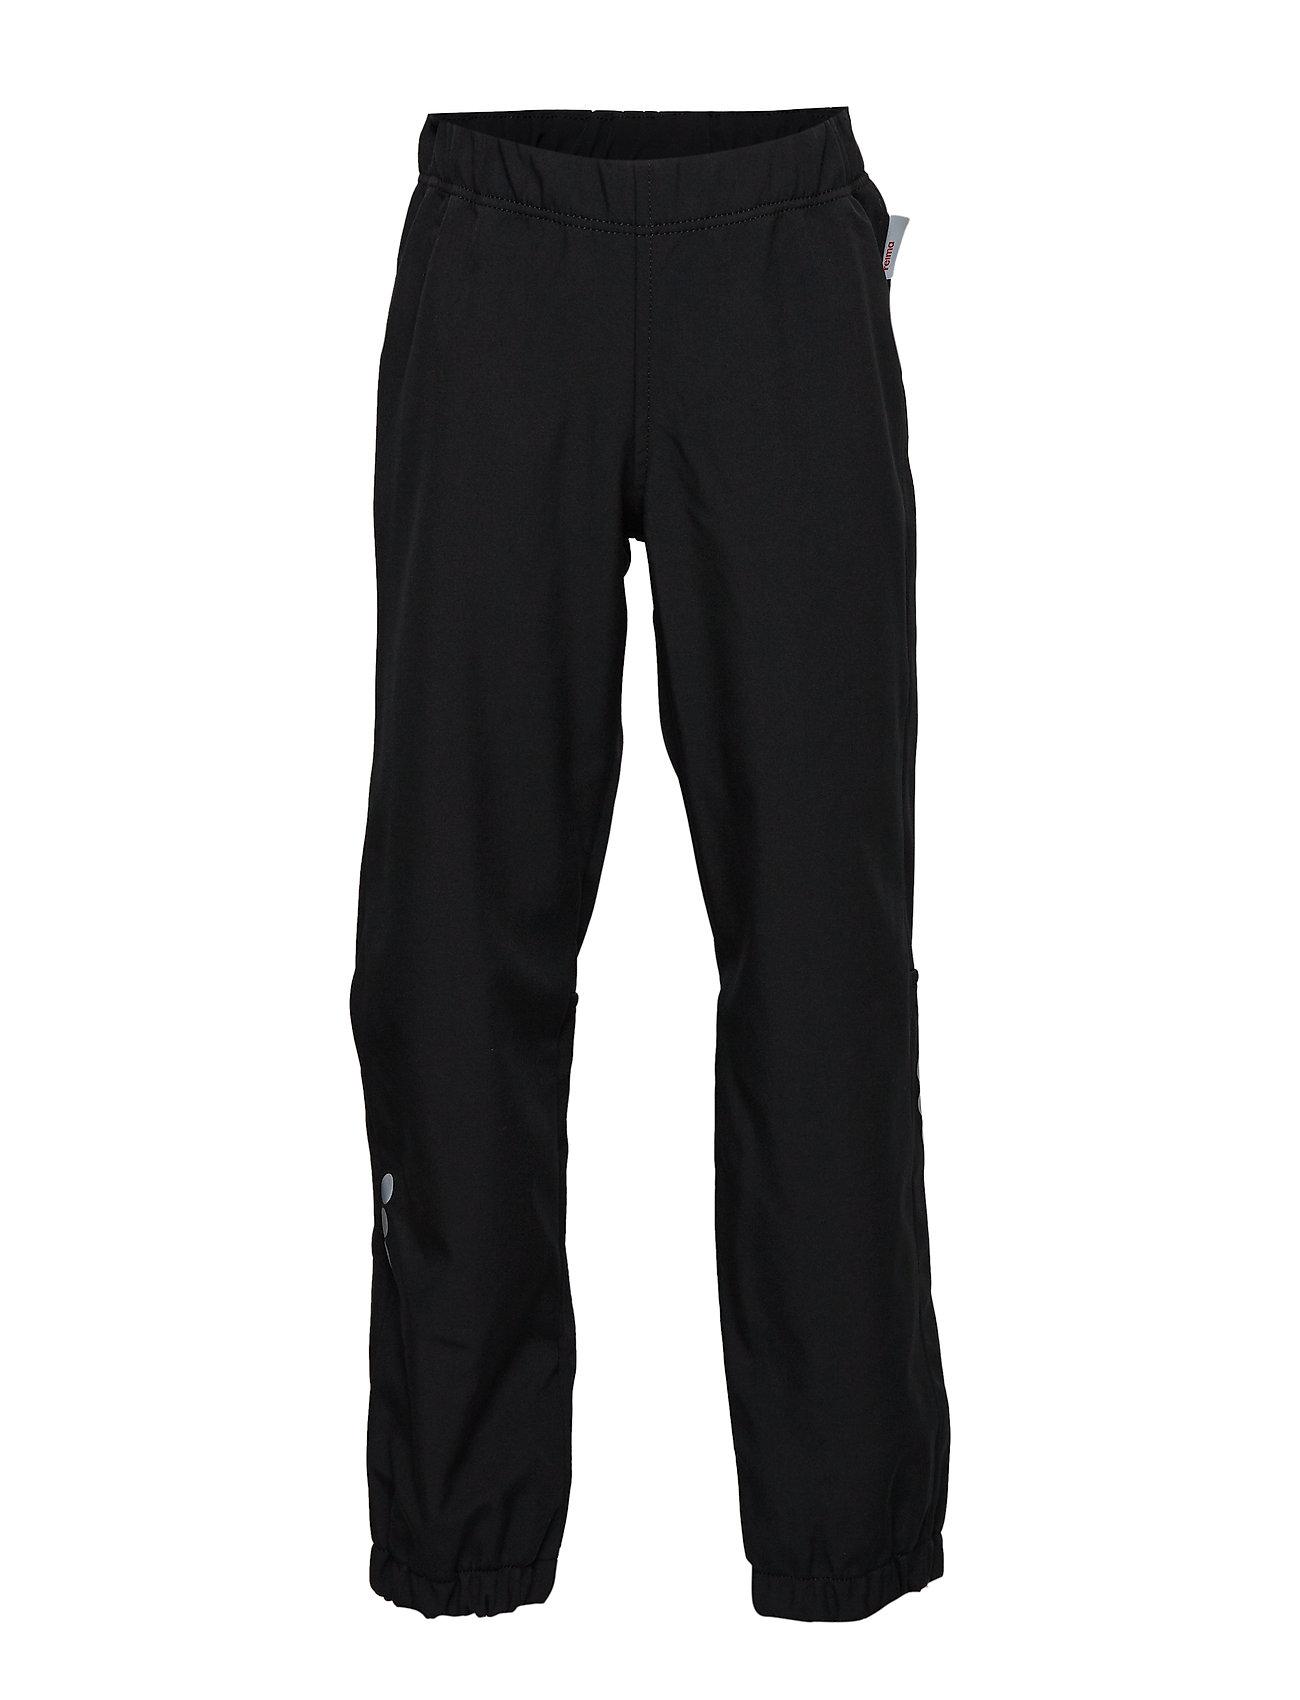 Oikotie Outerwear Thermo Outerwear Thermo Trousers Sort Reima